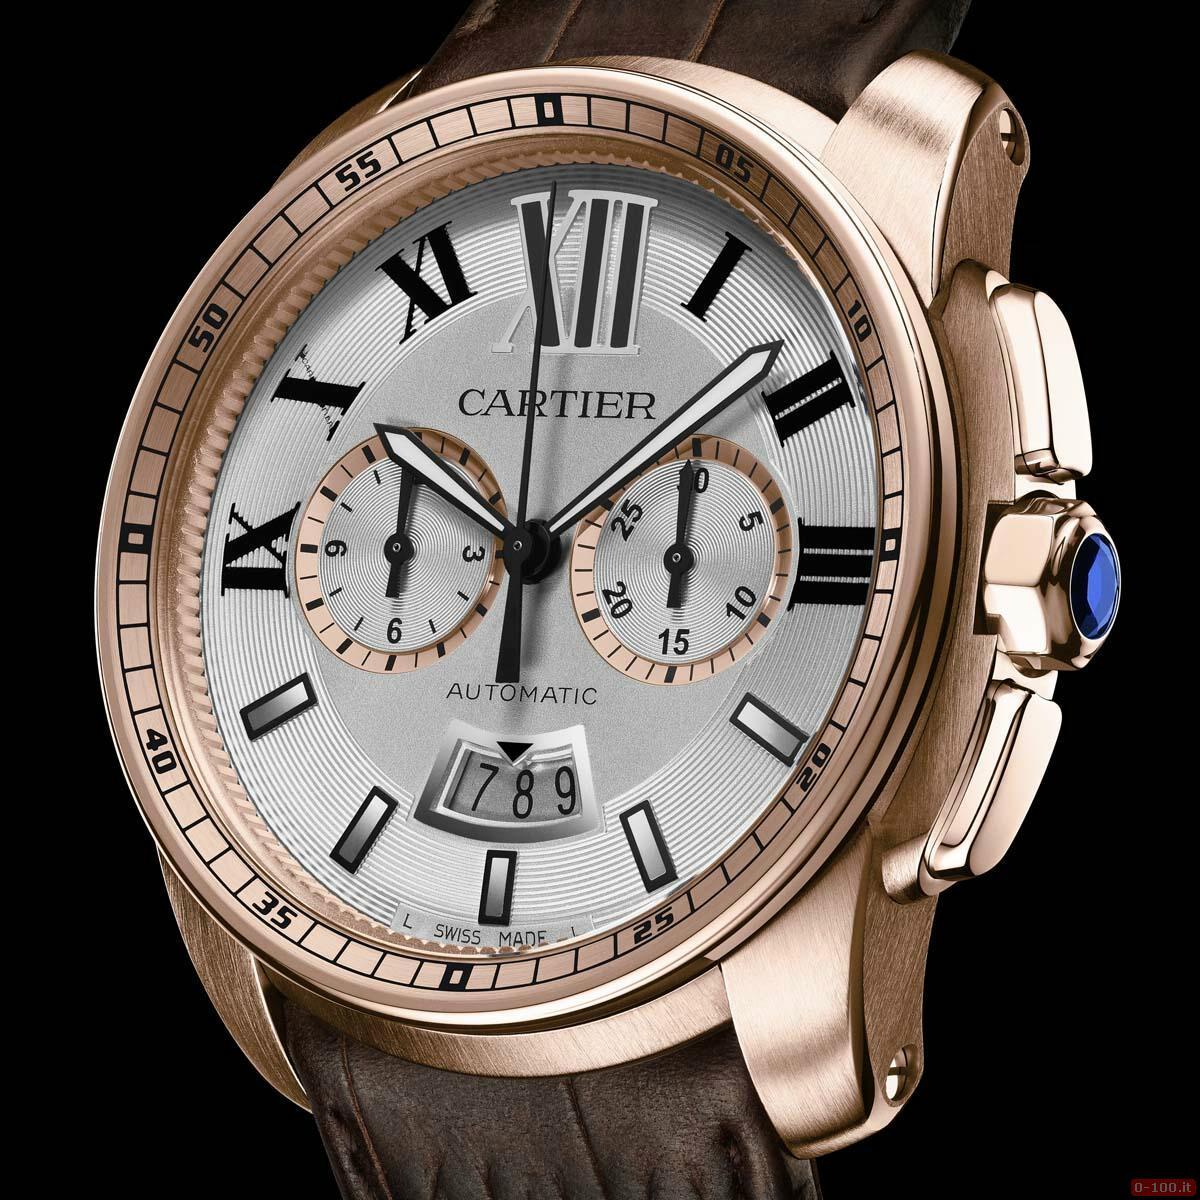 Cartier Calibre Chronograph Watch _0-1003